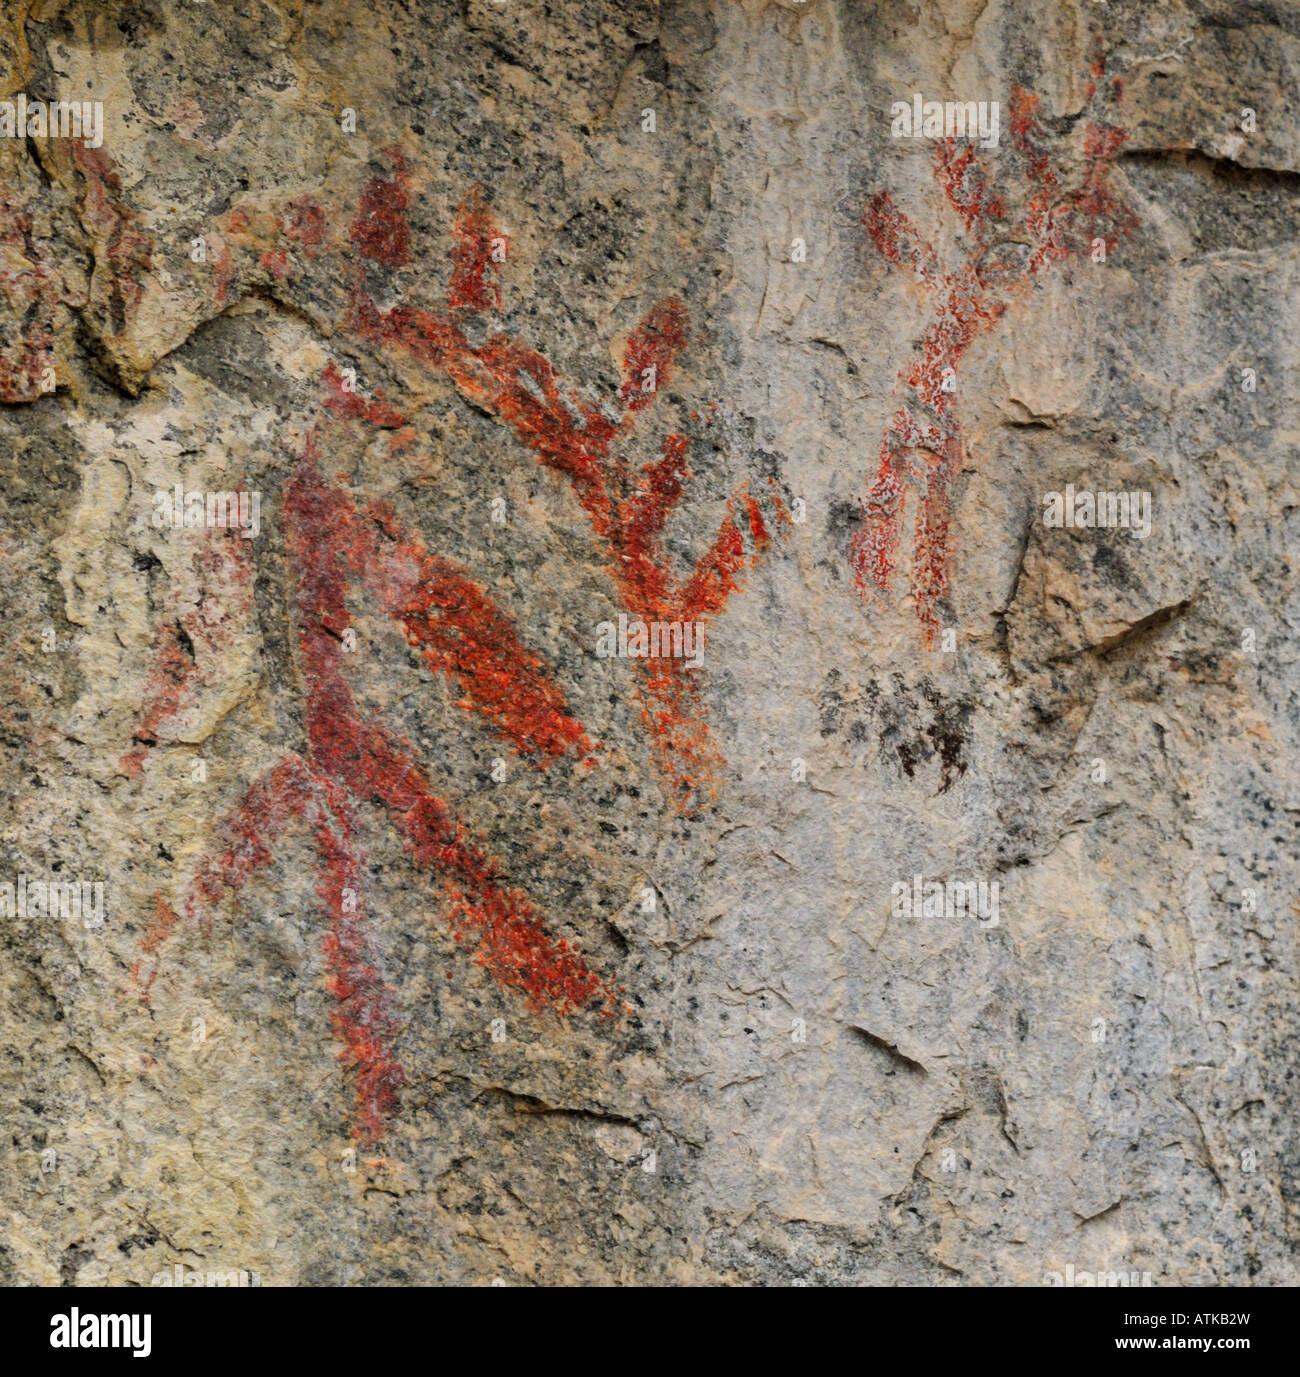 Pictograph (ancient aboriginal rock art), near Penticton, British Columbia, Canada - Stock Image